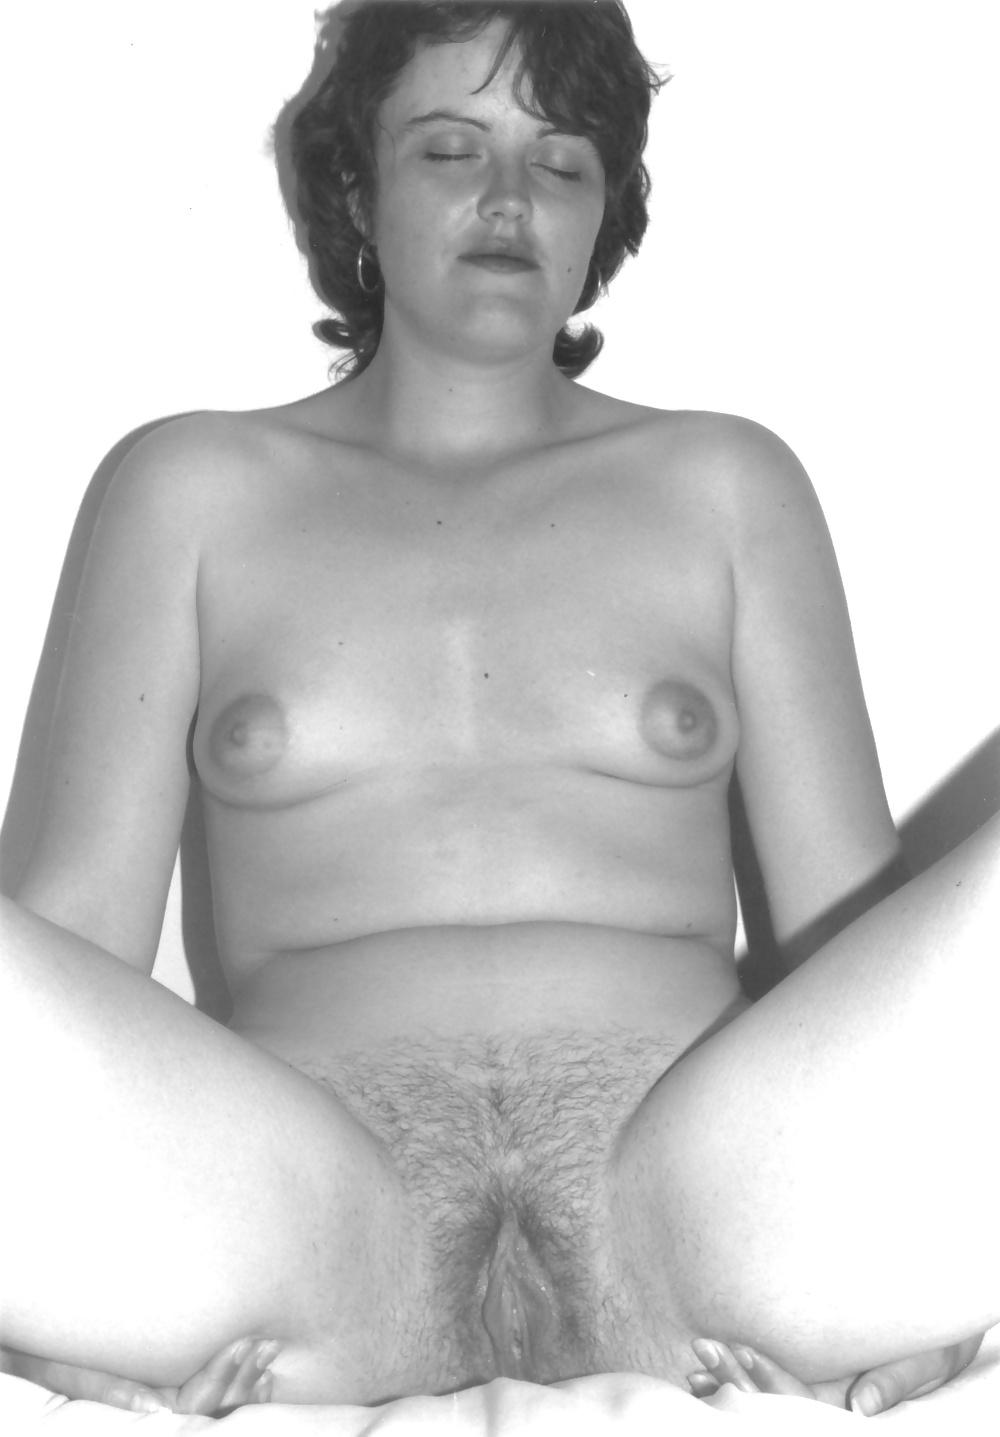 Penise inside vagina